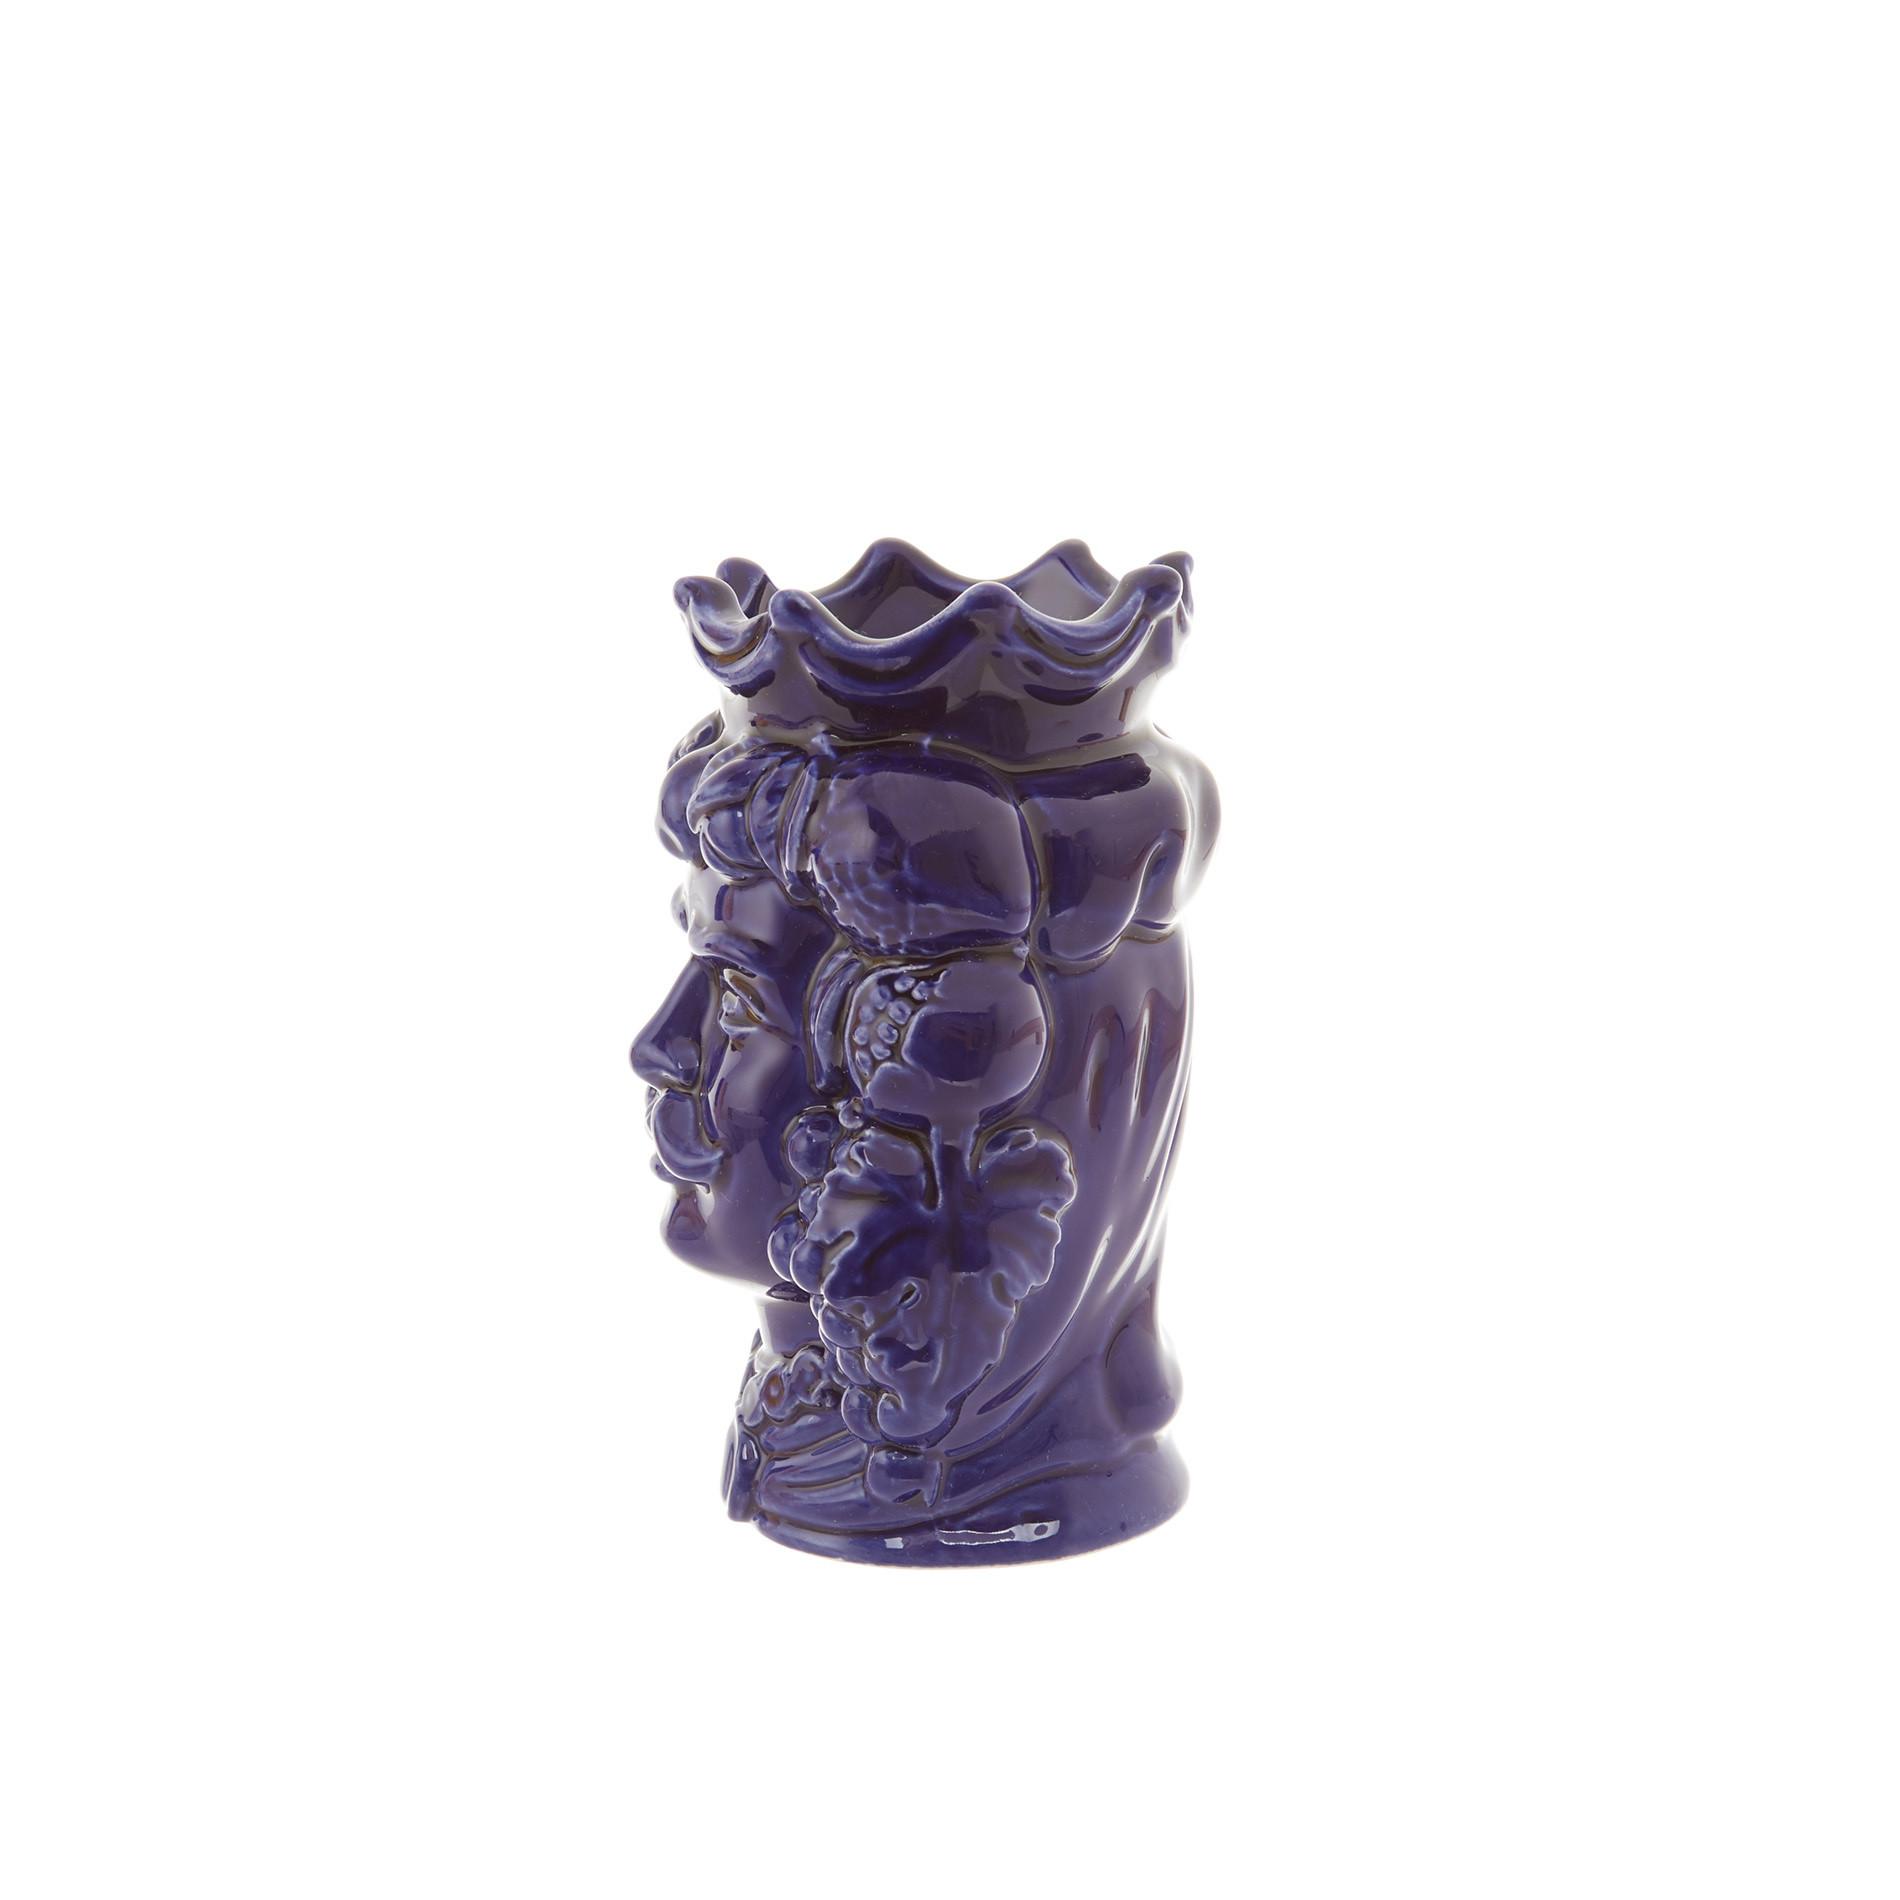 Testa di moro by Ceramiche Siciliane Ruggeri, Blu, large image number 1